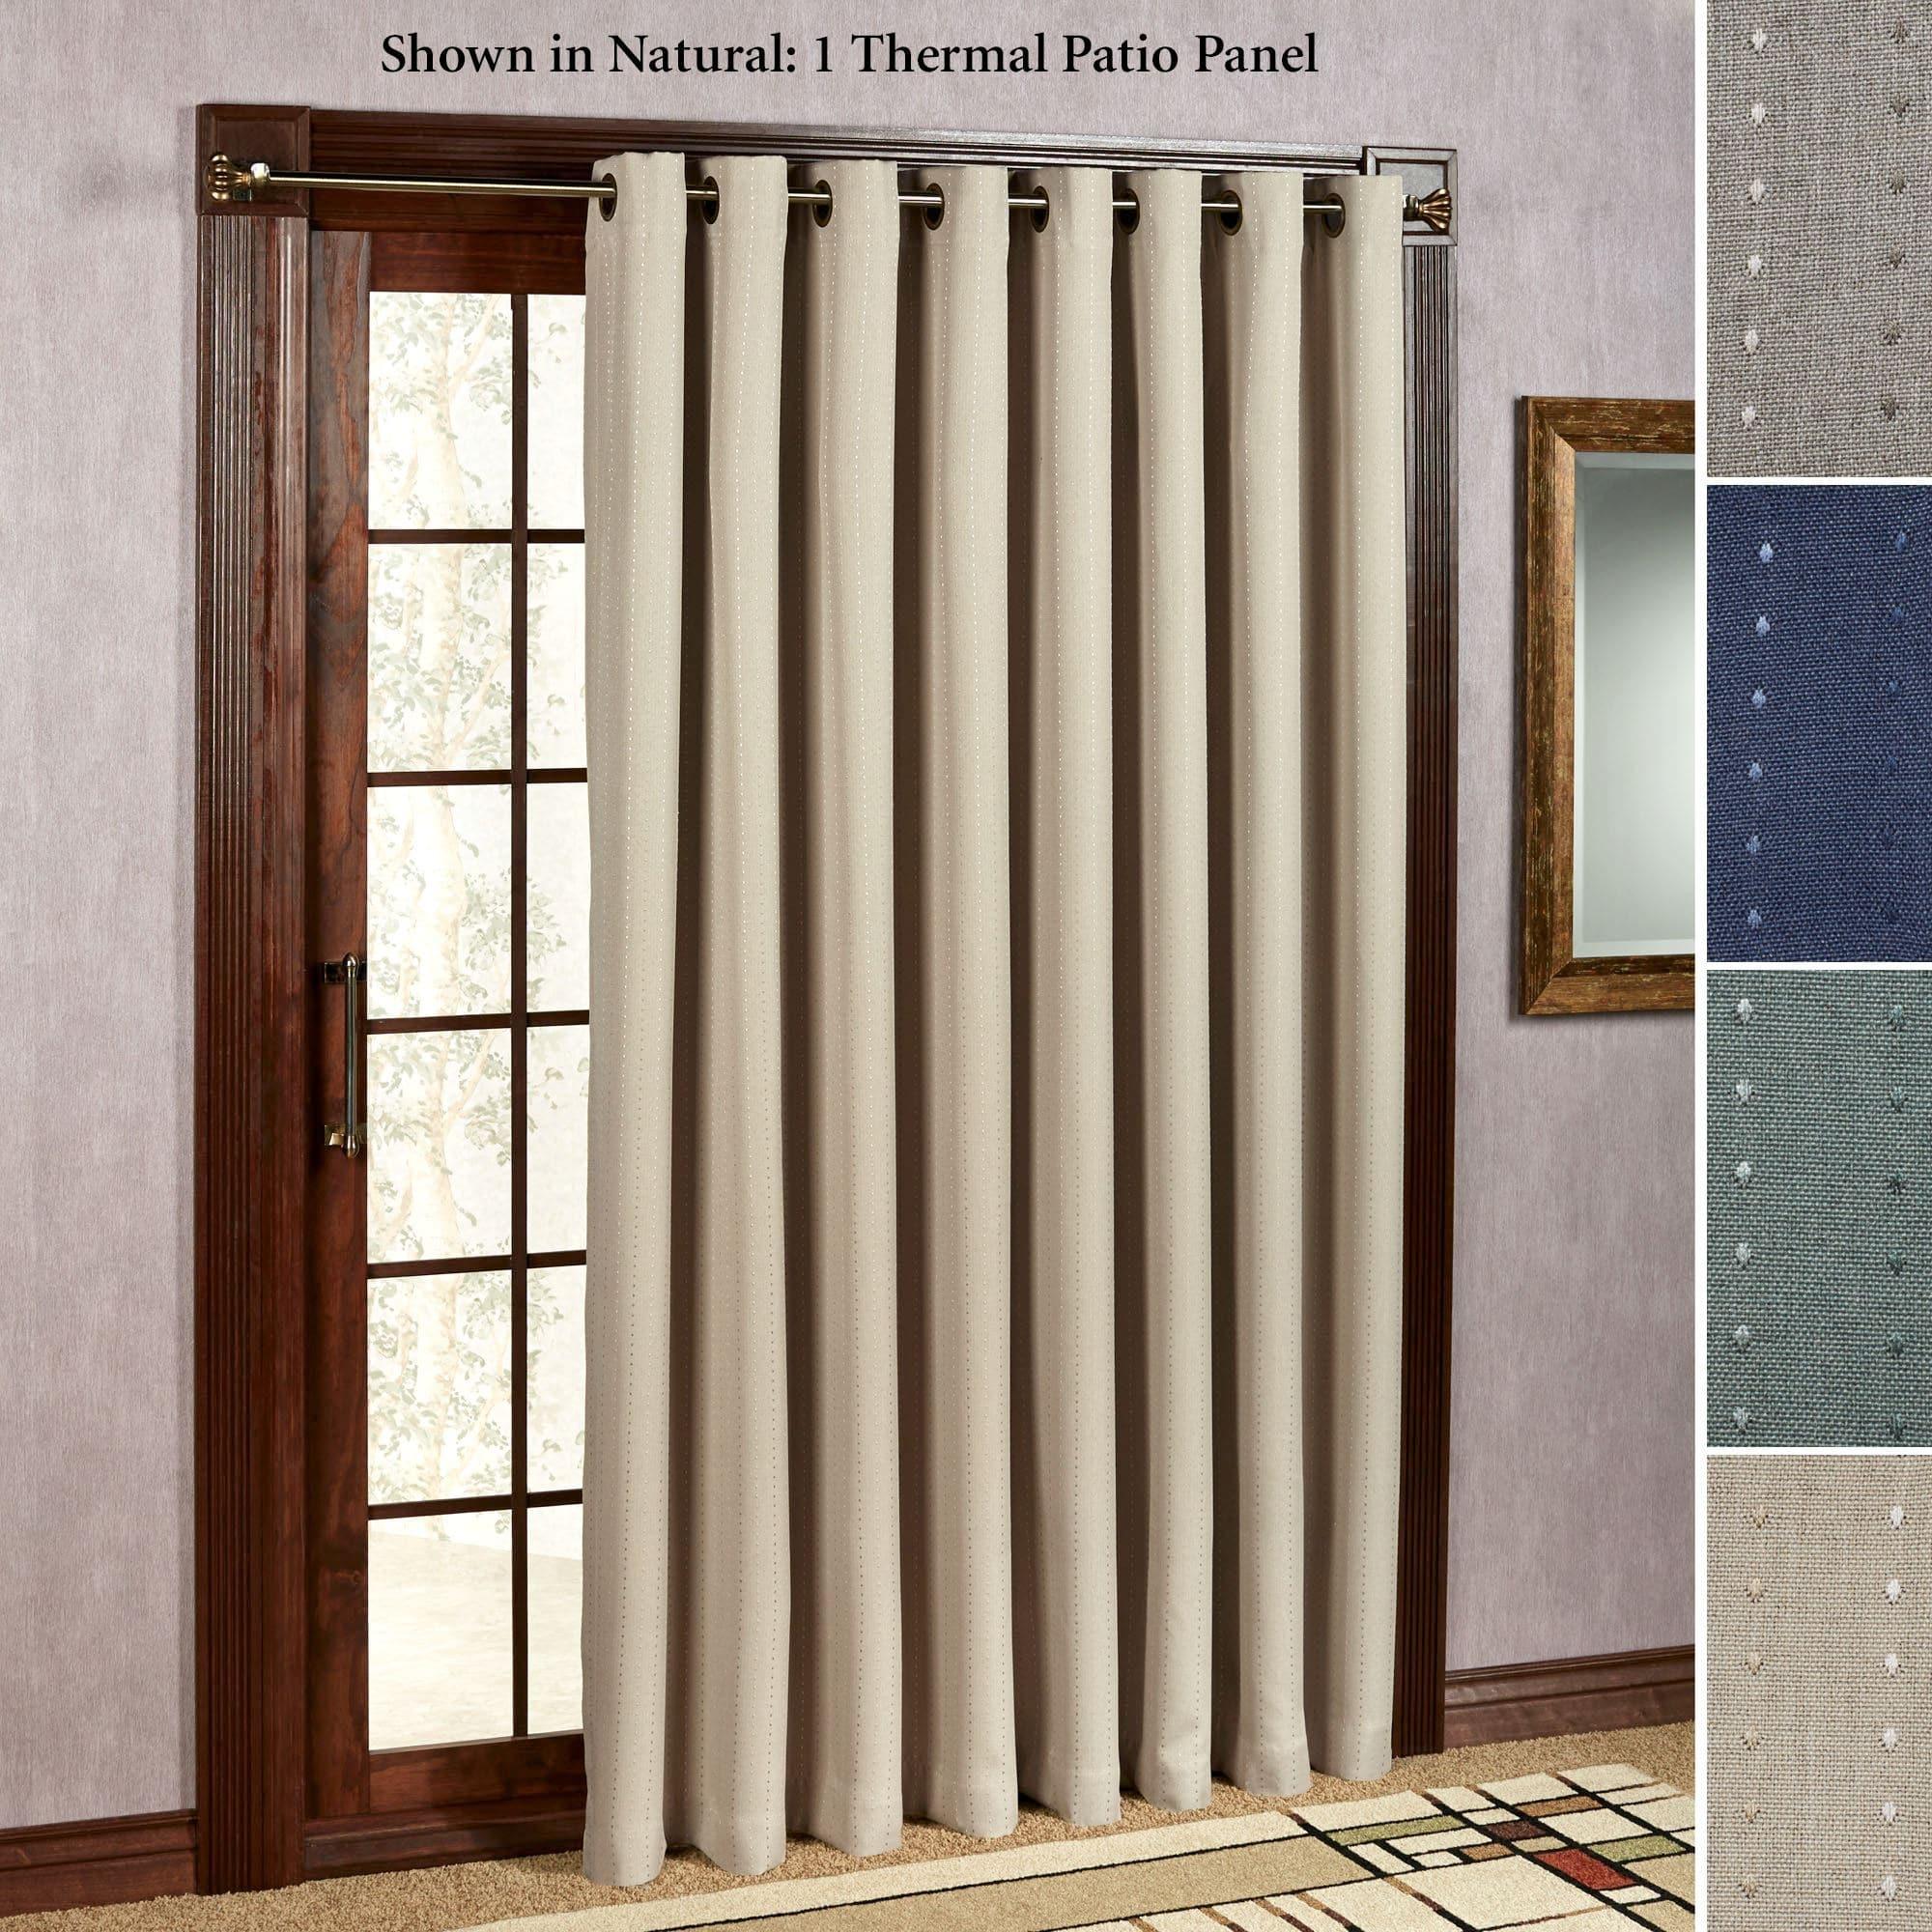 Curtains For Sliding Glass DoorsCurtains For Sliding Glass Doors